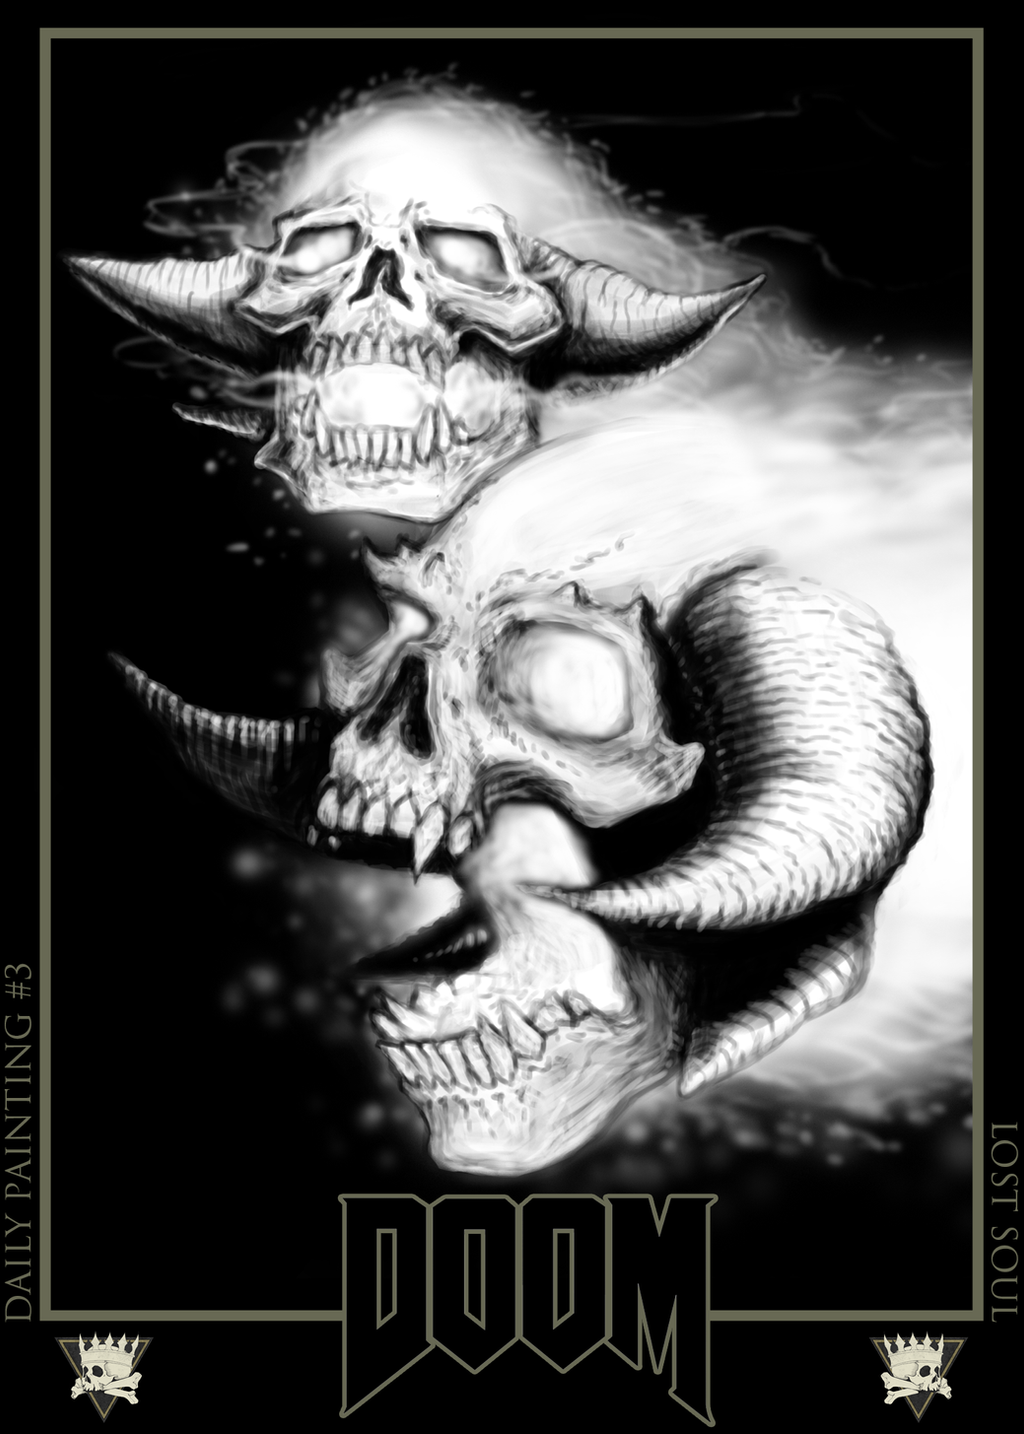 Lost Soul Doom Deviantart: Doom Daily Paint #3: Lost Souls By MagnumImago On DeviantArt